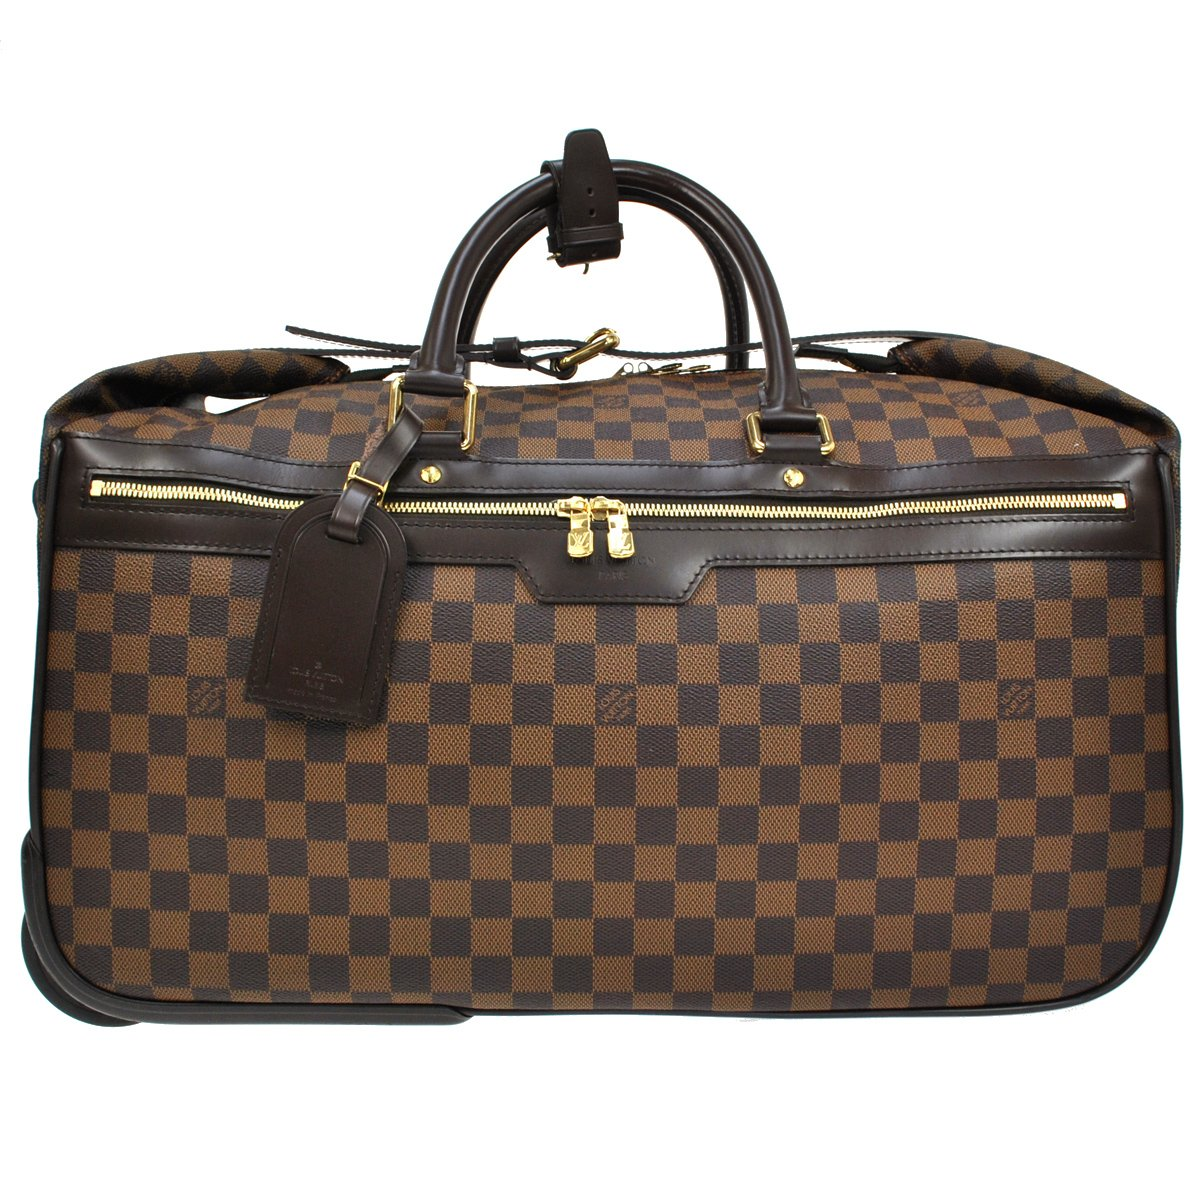 a48f400adb64 Home   Designer Brand   Louis Vuitton   Weekend Travel bag   Louis Vuitton  Damier Ebene Eole 50 Rolling Carry-on Suitcase Duffel